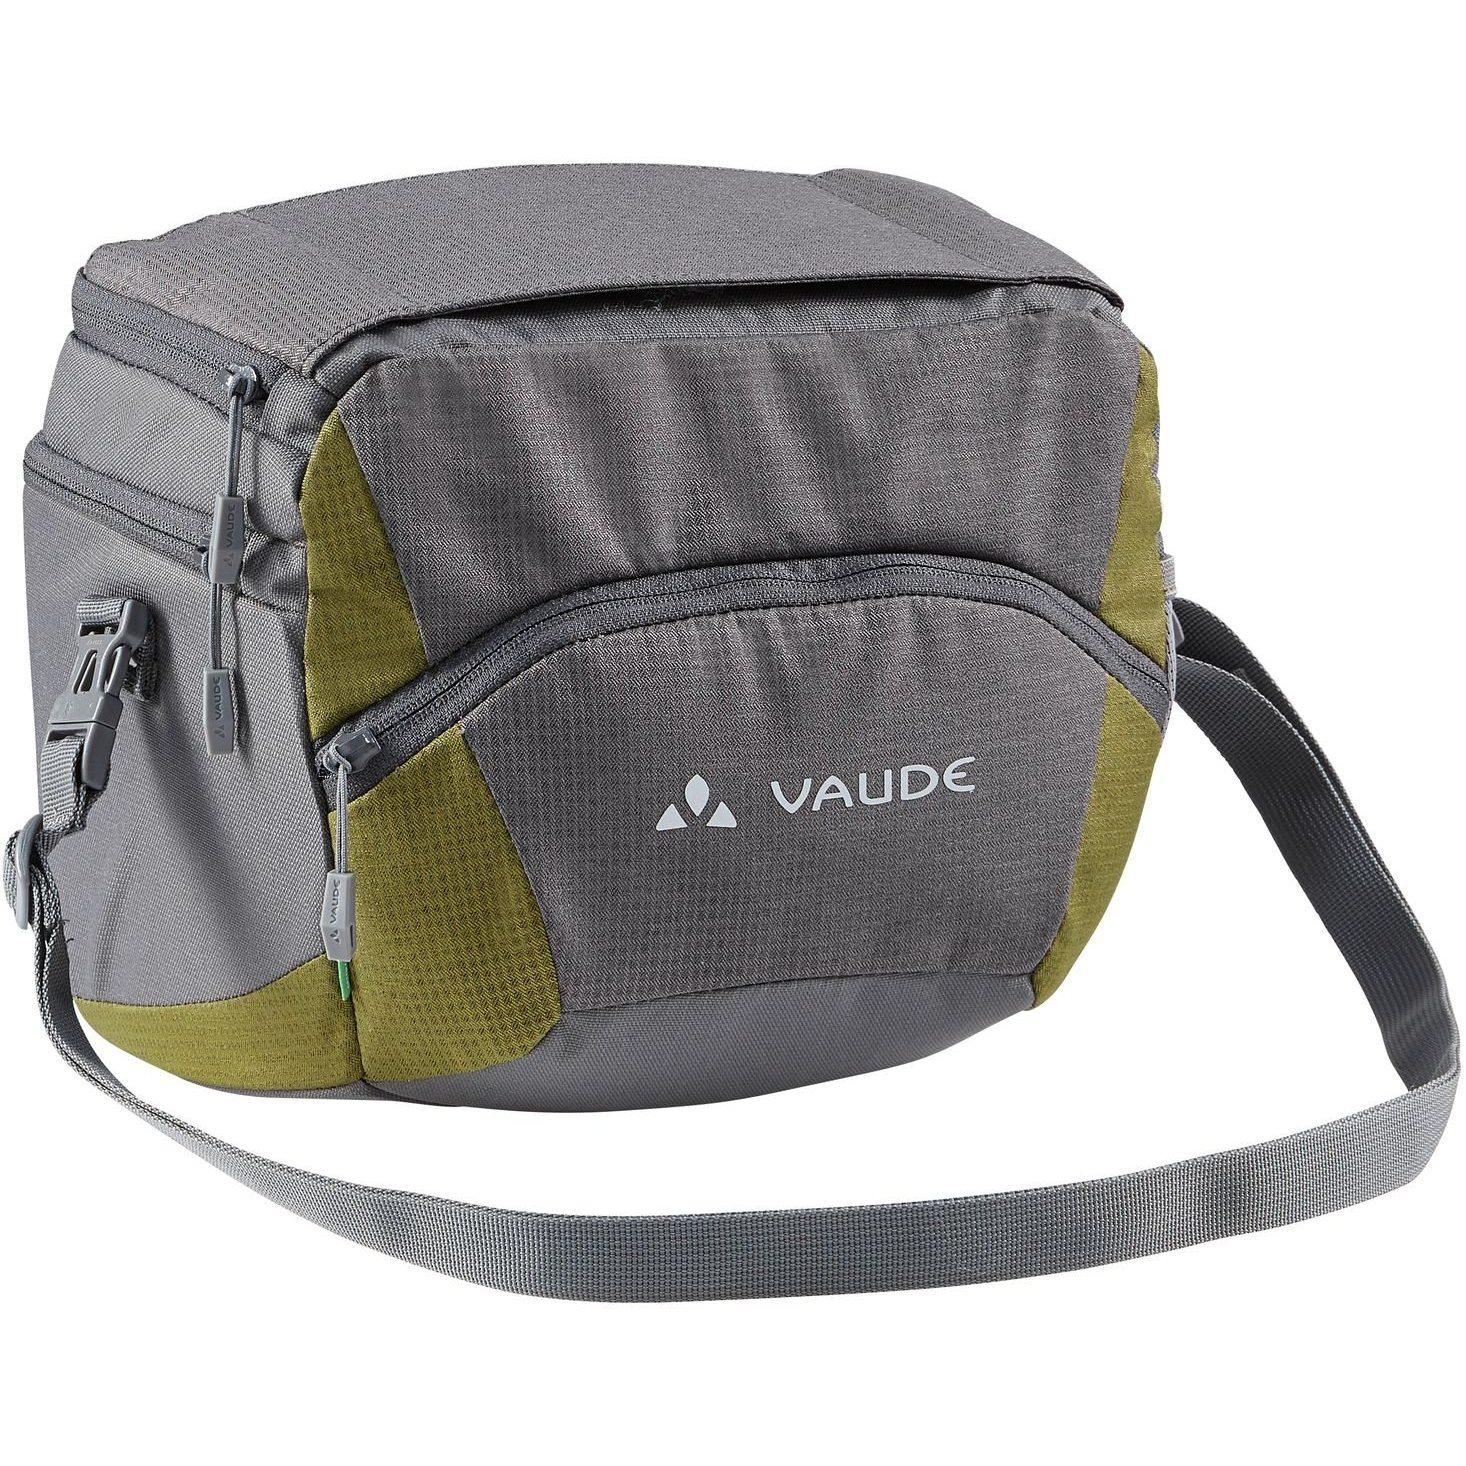 Bild von Vaude OnTour Box L (KLICKfix ready) Lenkertasche - iron/bamboo